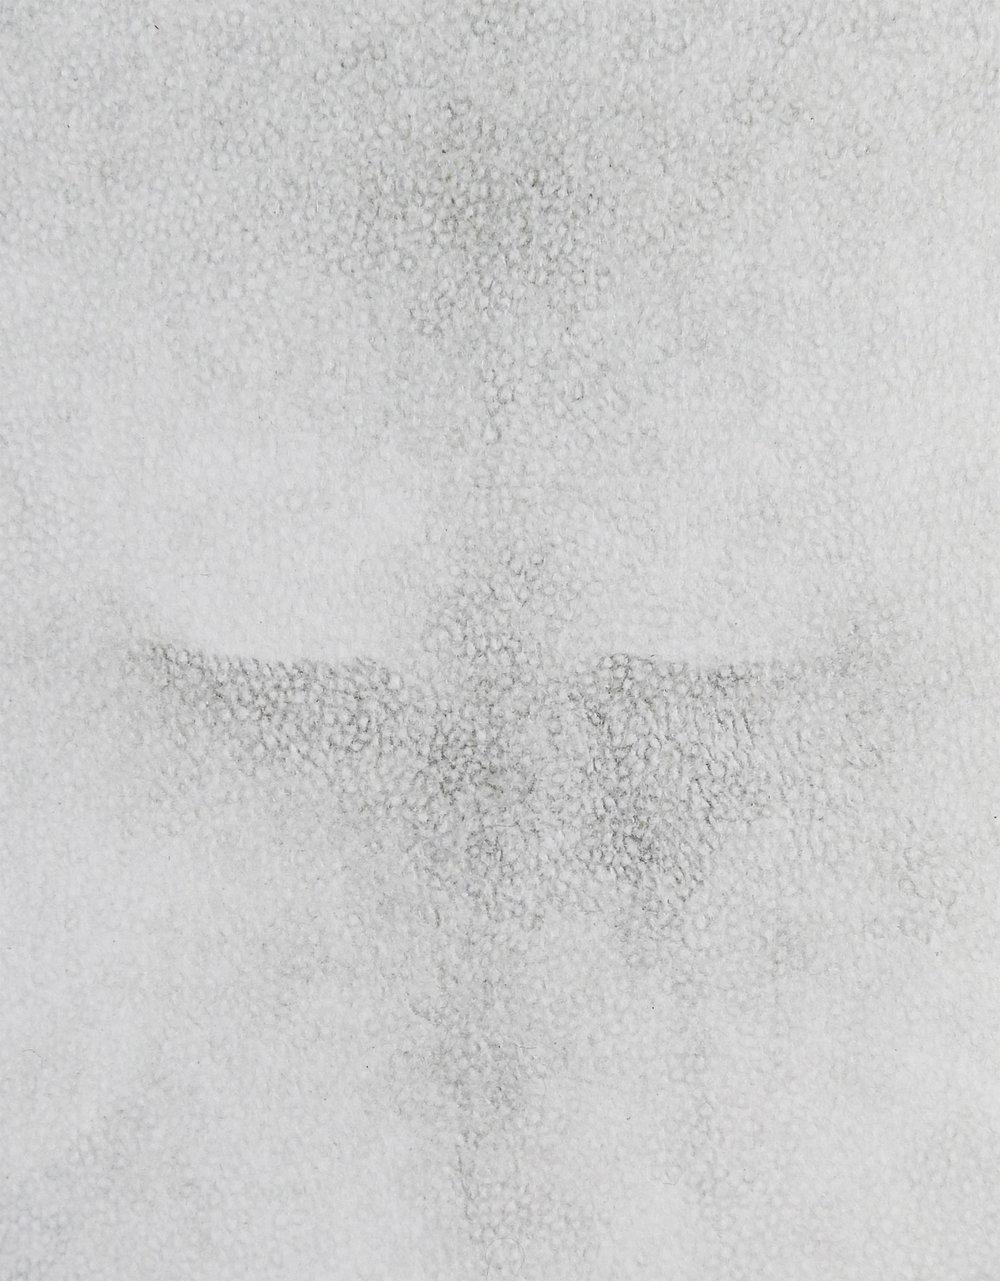 Negative-Space-detailH-72dpi-1500px-web.jpg